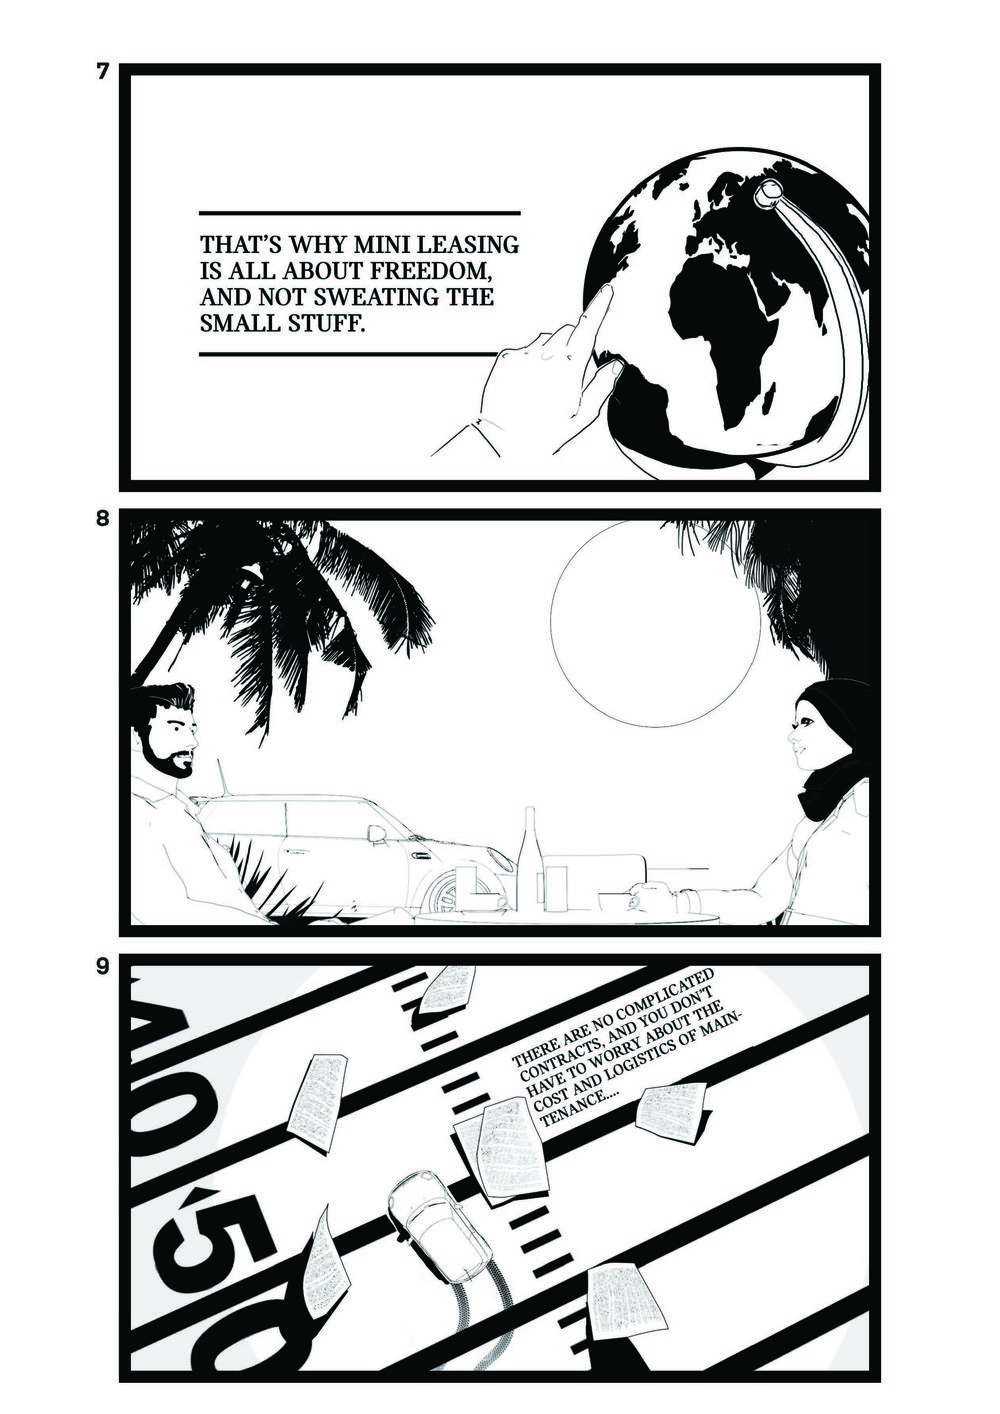 Storyboard_MINI_leasing_v4_final_Page_5.jpg